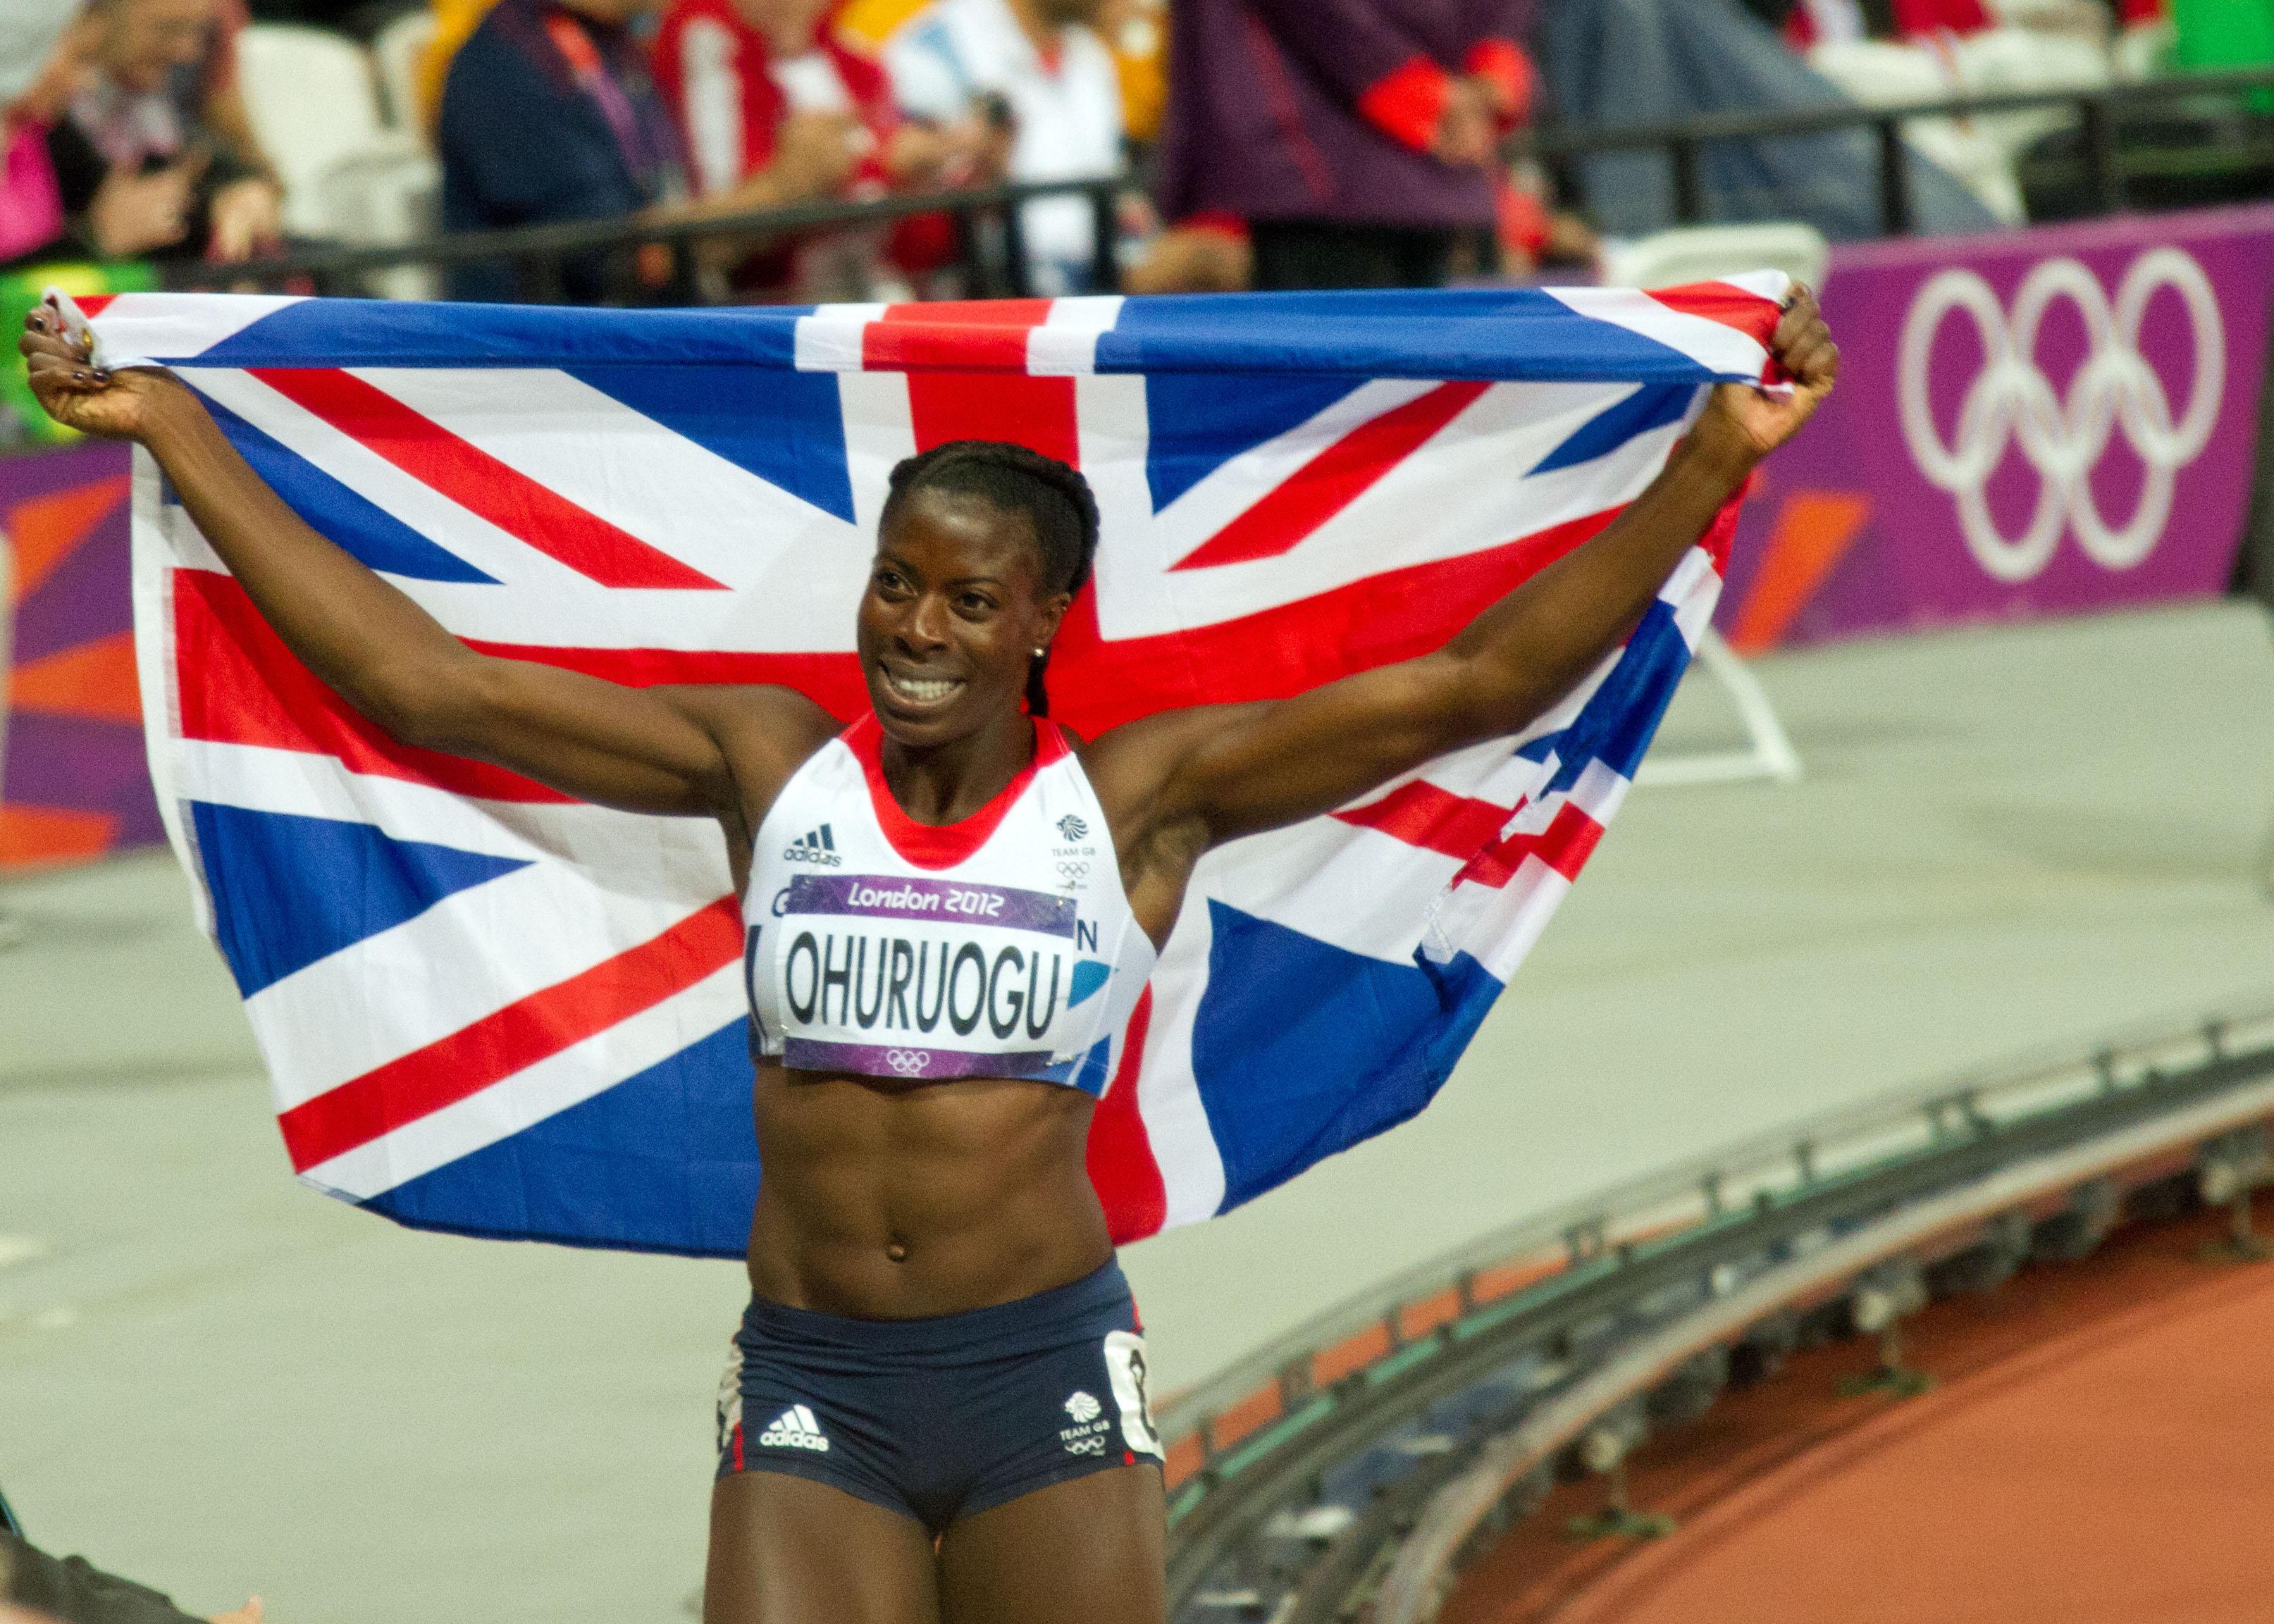 Christina OhuruoguSilver medalist London 2012